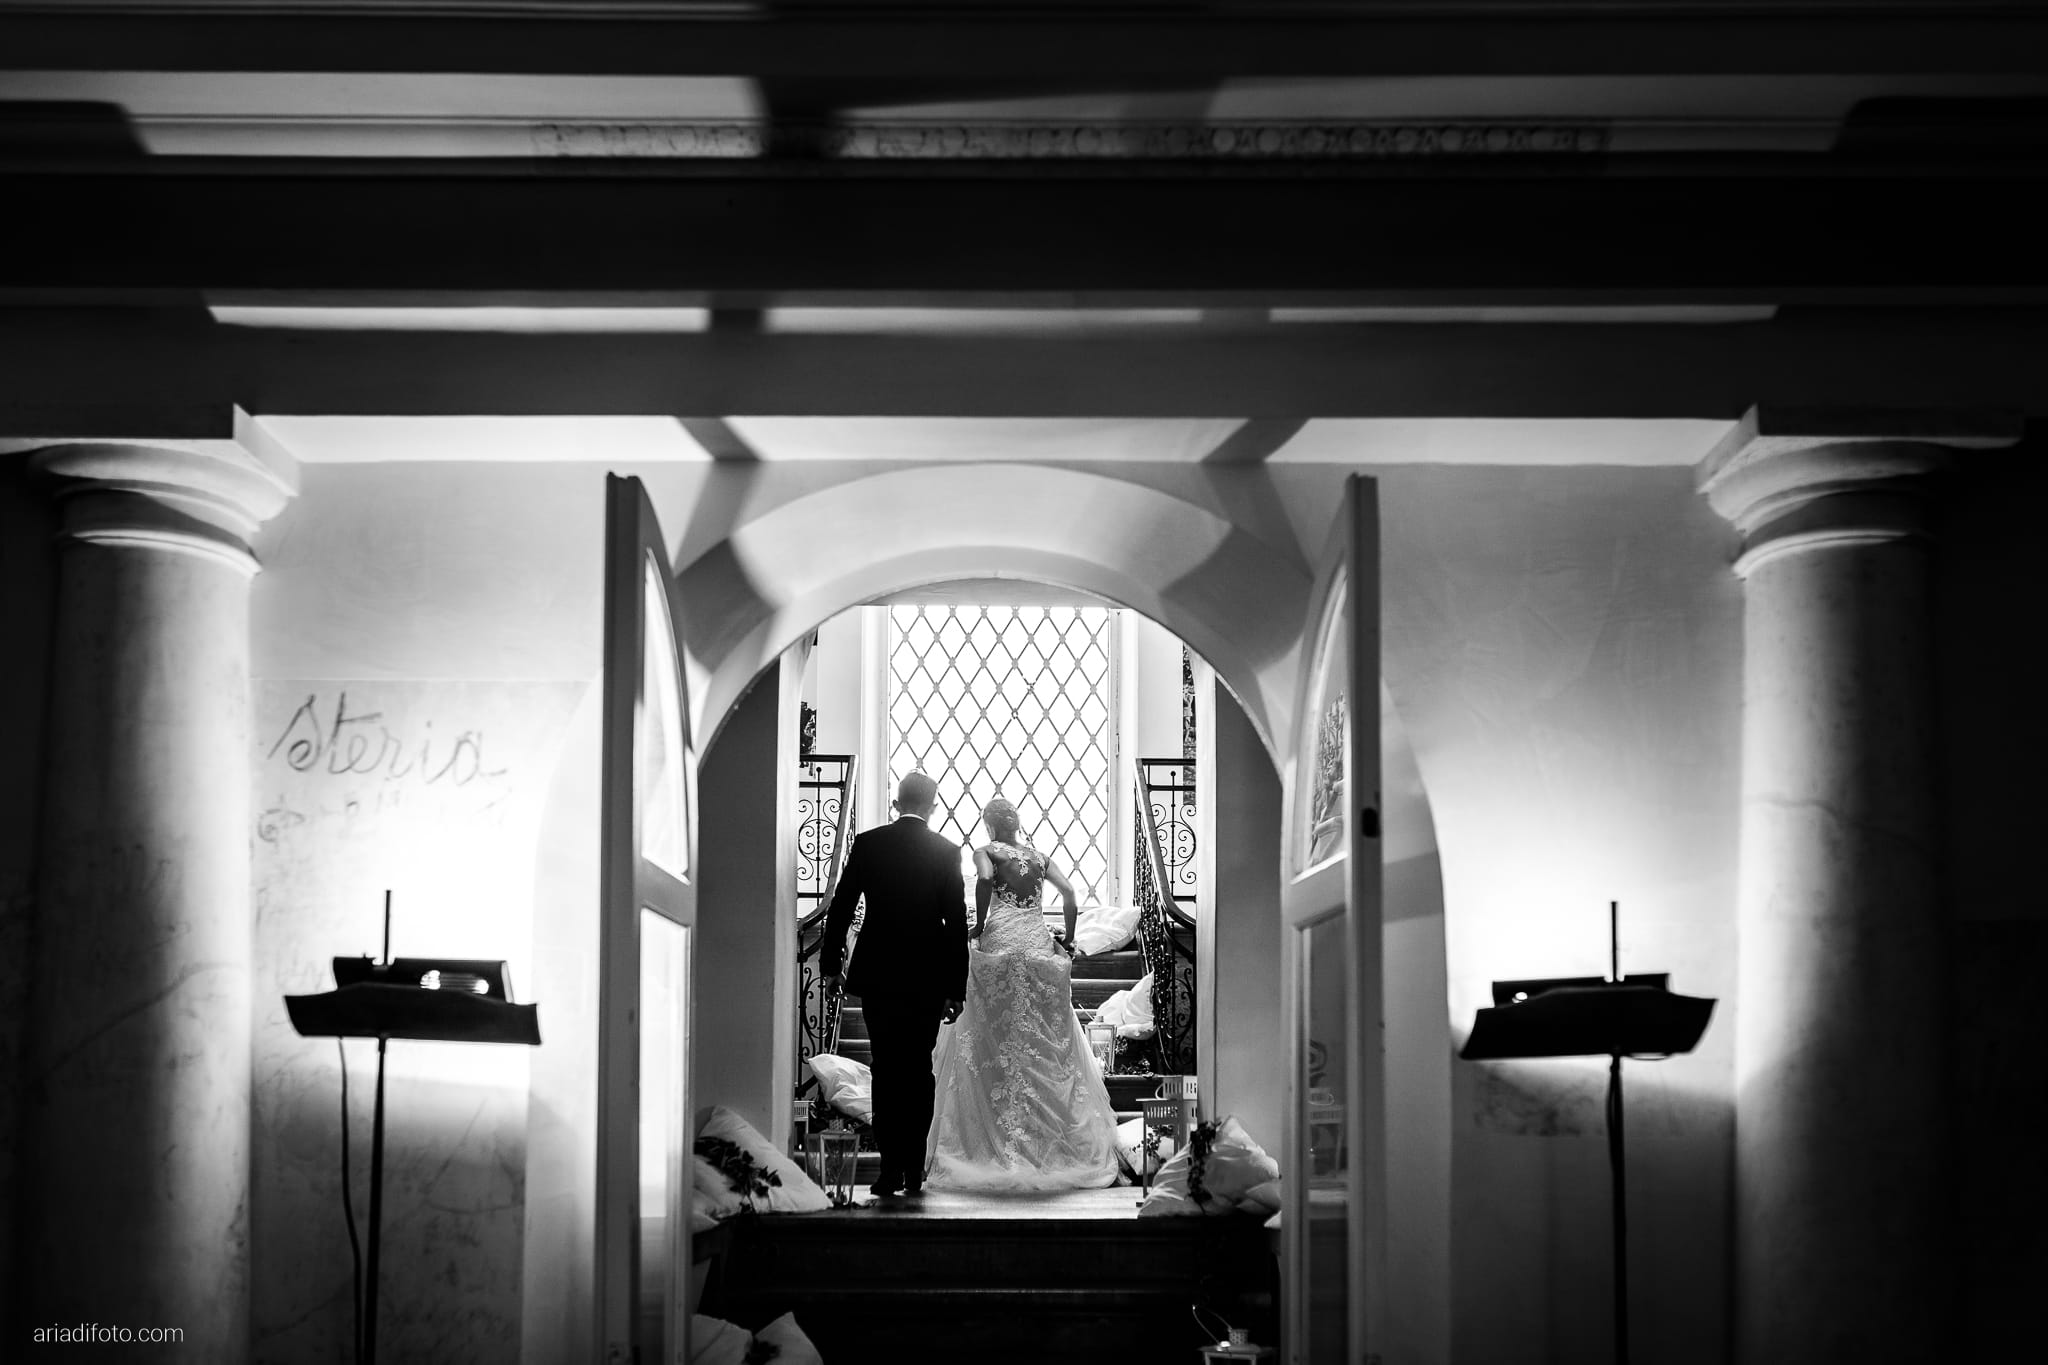 Valentina Marco Matrimonio Duomo Gorizia Castelvecchio Sagrado ricevimento pranzo